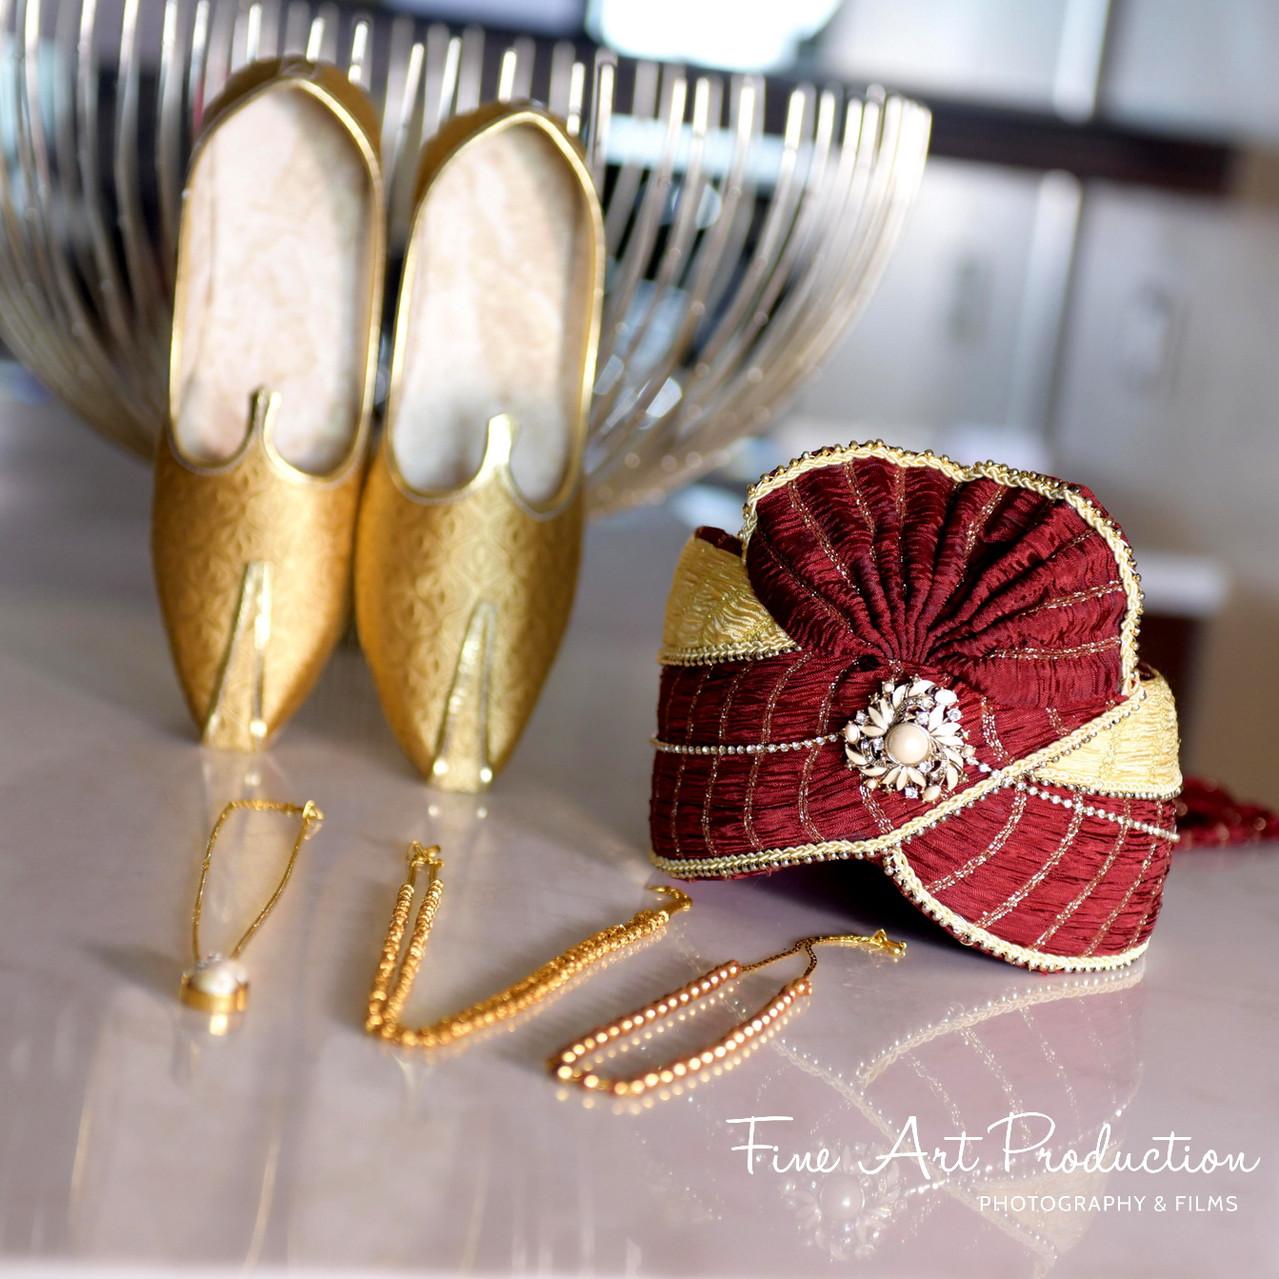 Hyatt-Regency-Grand-Cypress-Indian-Wedding-Photography-Fine-Art-Production-Amish-Thakkar_03